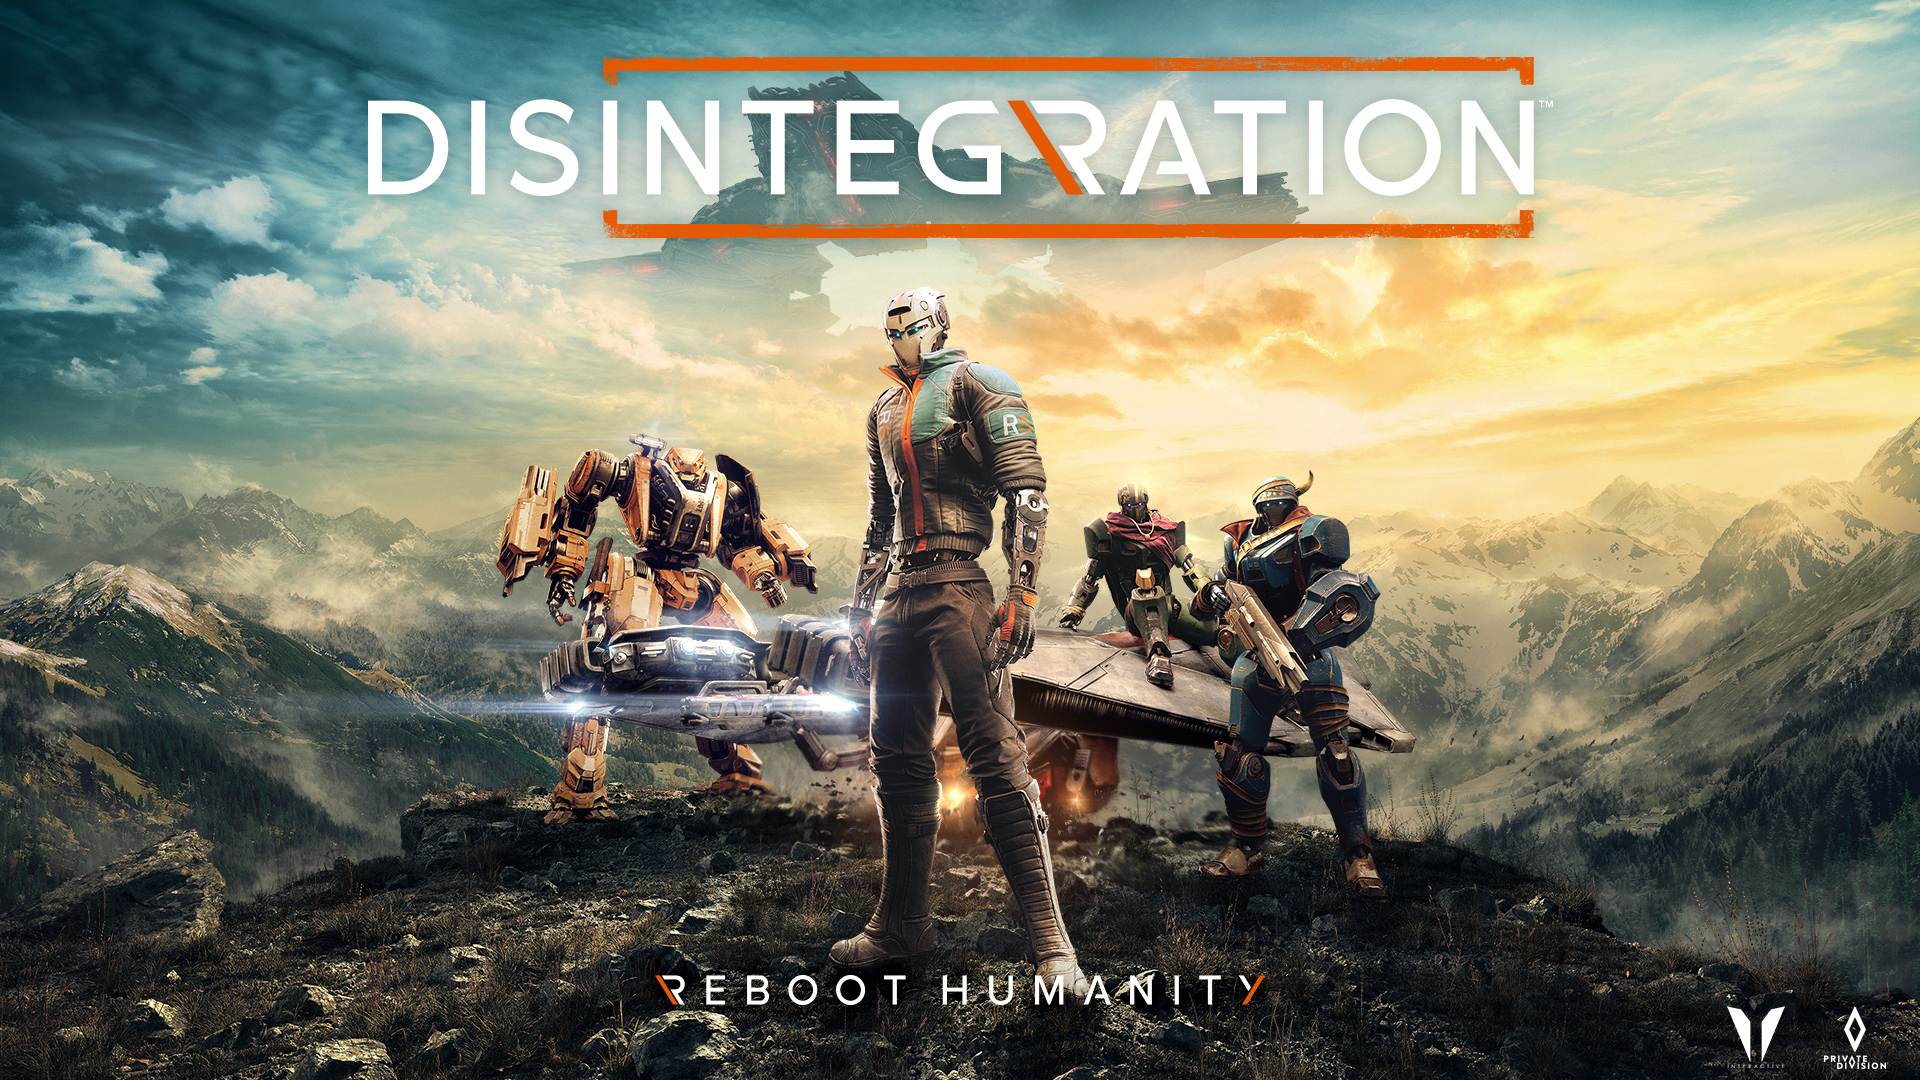 Disintegration Official Artwork Reveal